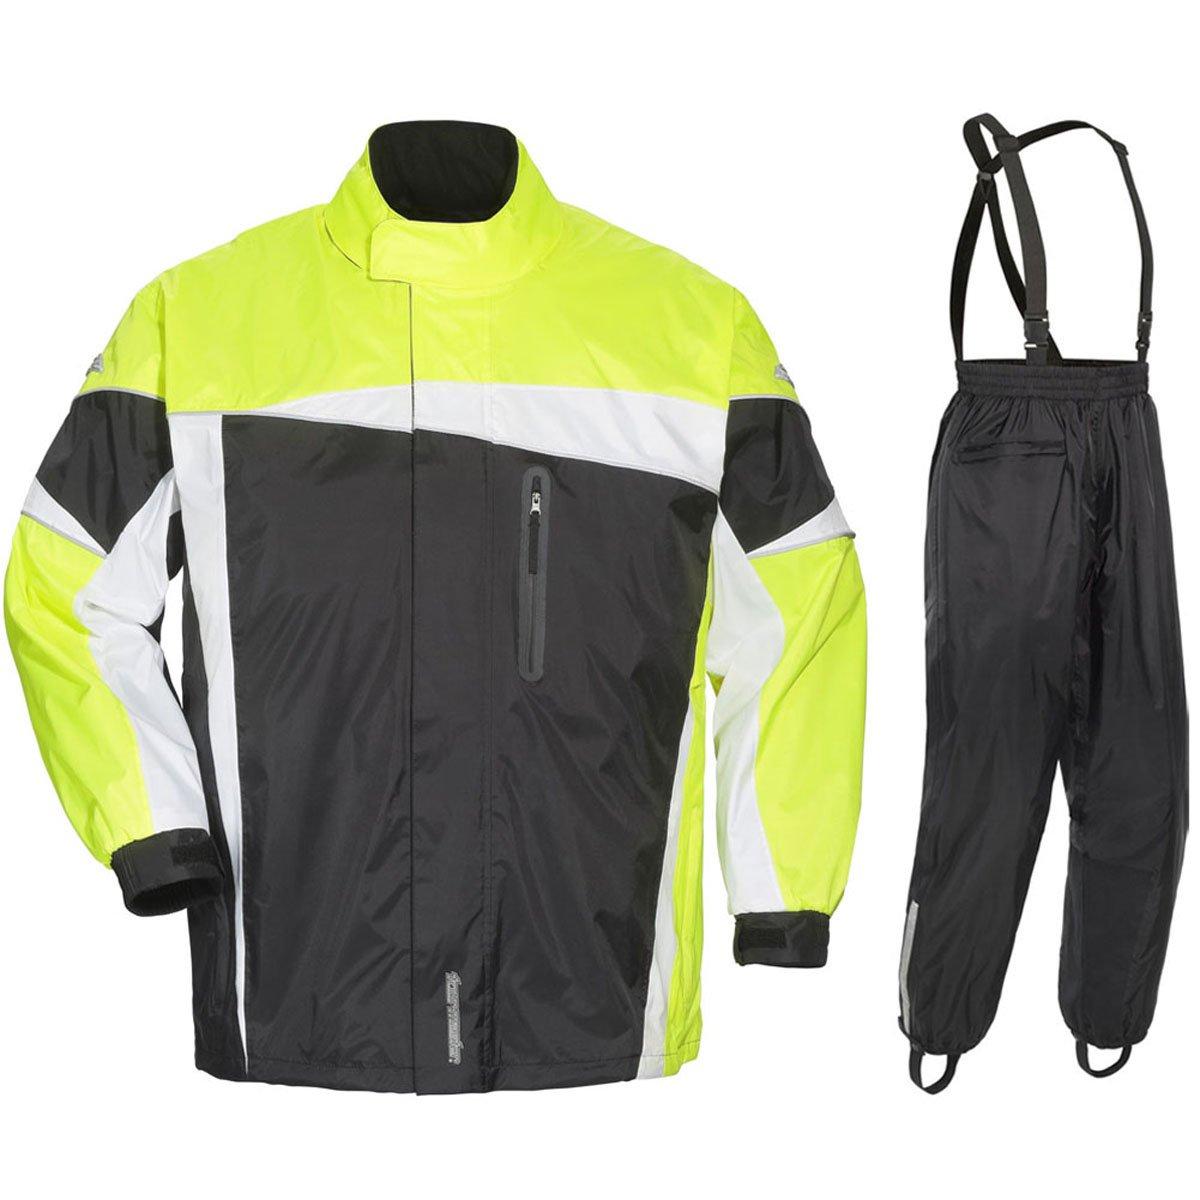 Tour Master Defender 2.0 Men's 2-Piece Street Bike Racing Motorcycle Rain Suit - Black/Hi-Viz / Medium